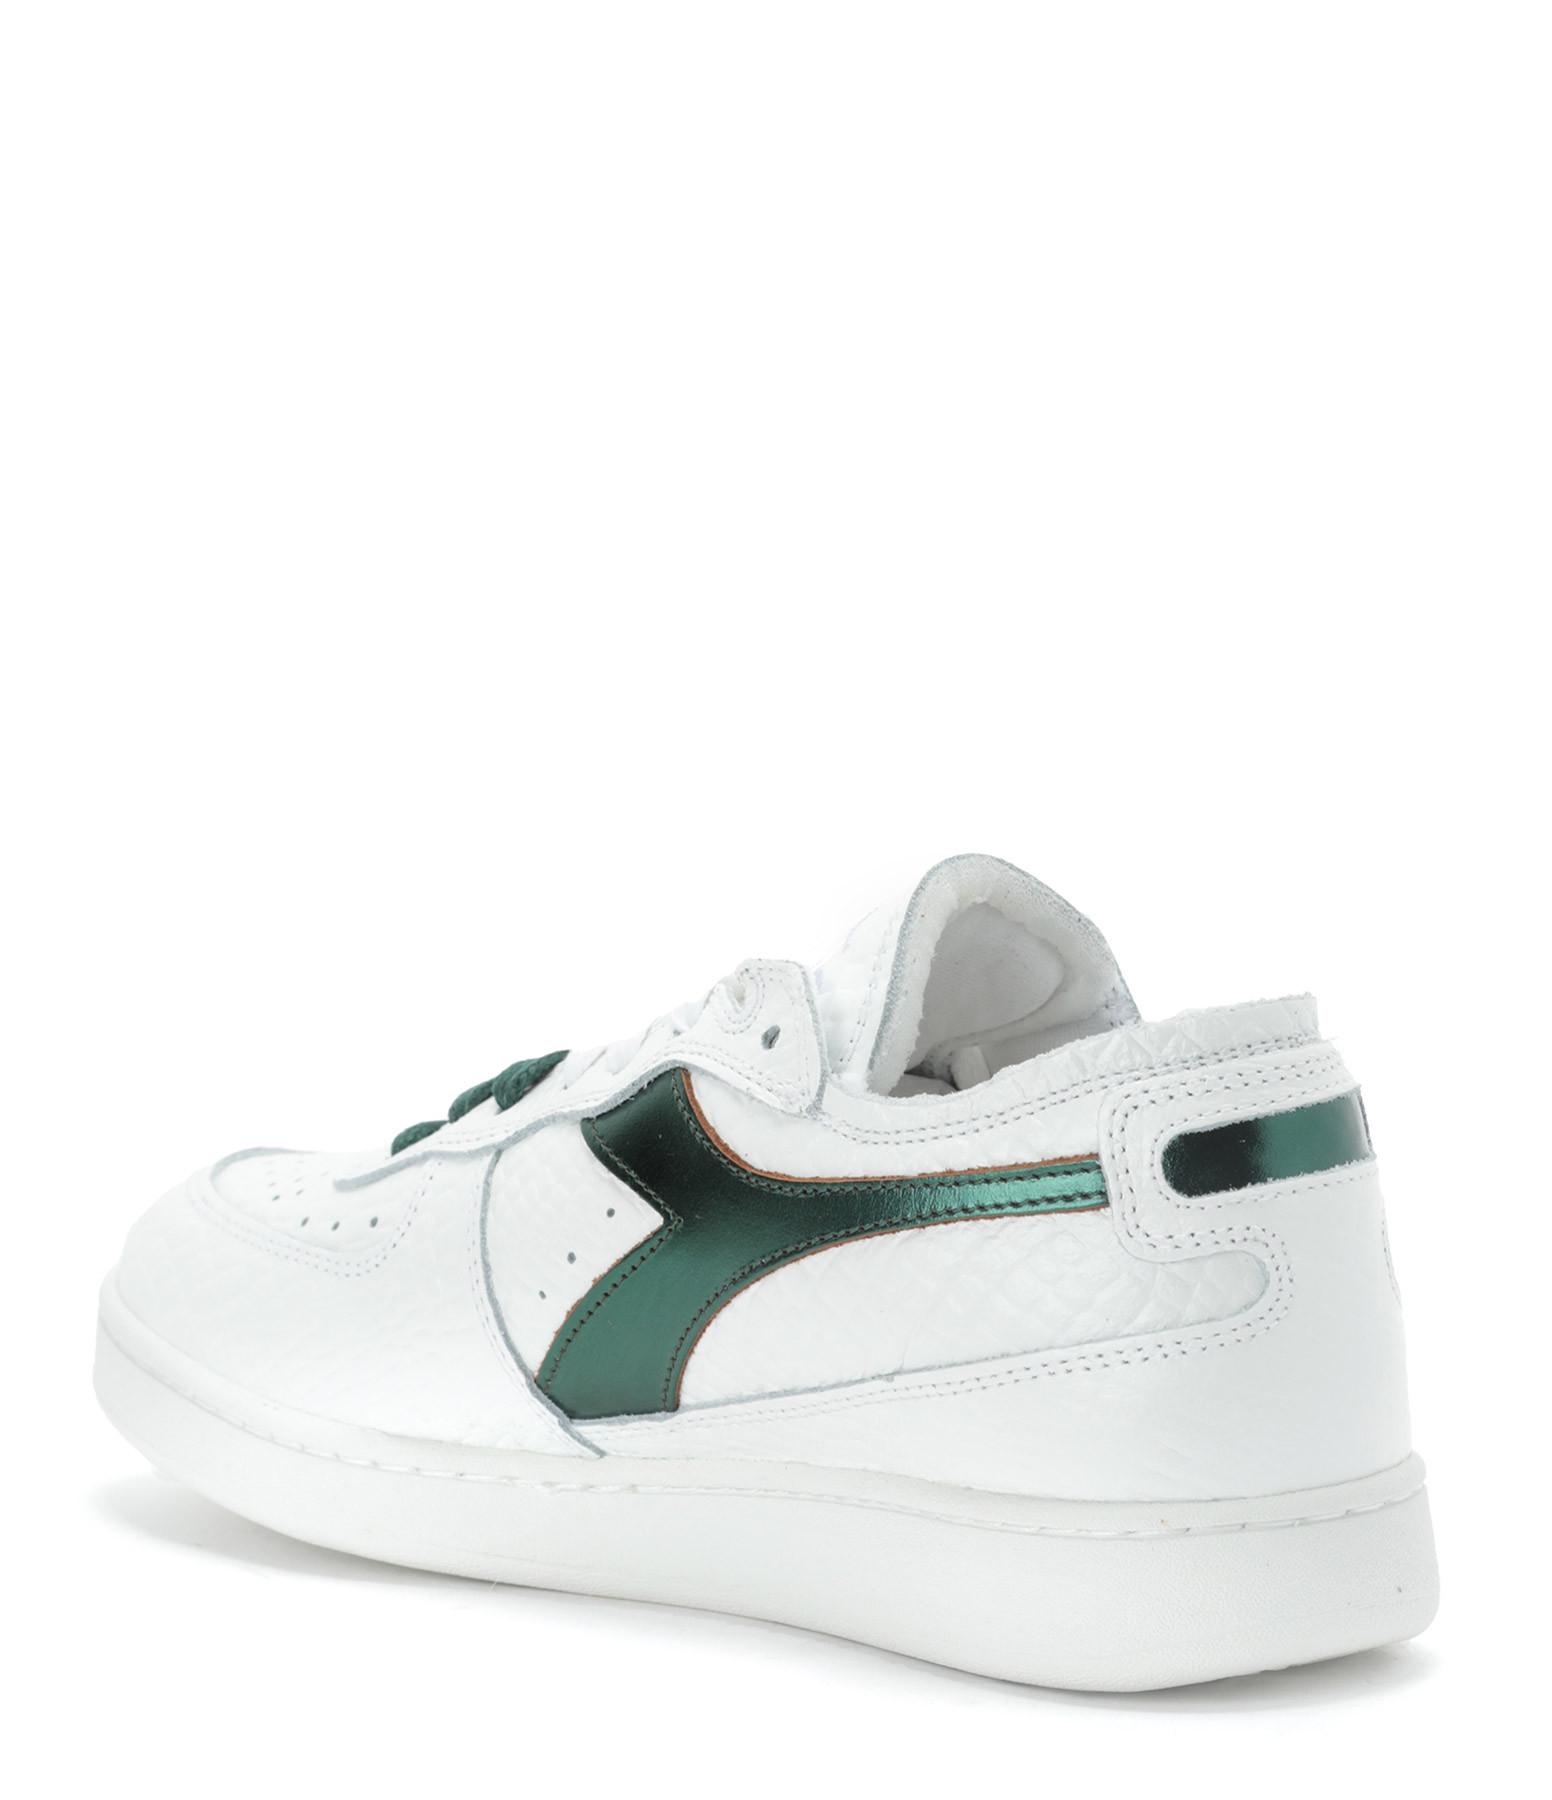 DIADORA - Baskets Mi Basket Row Cut Cuir Cocco Vert